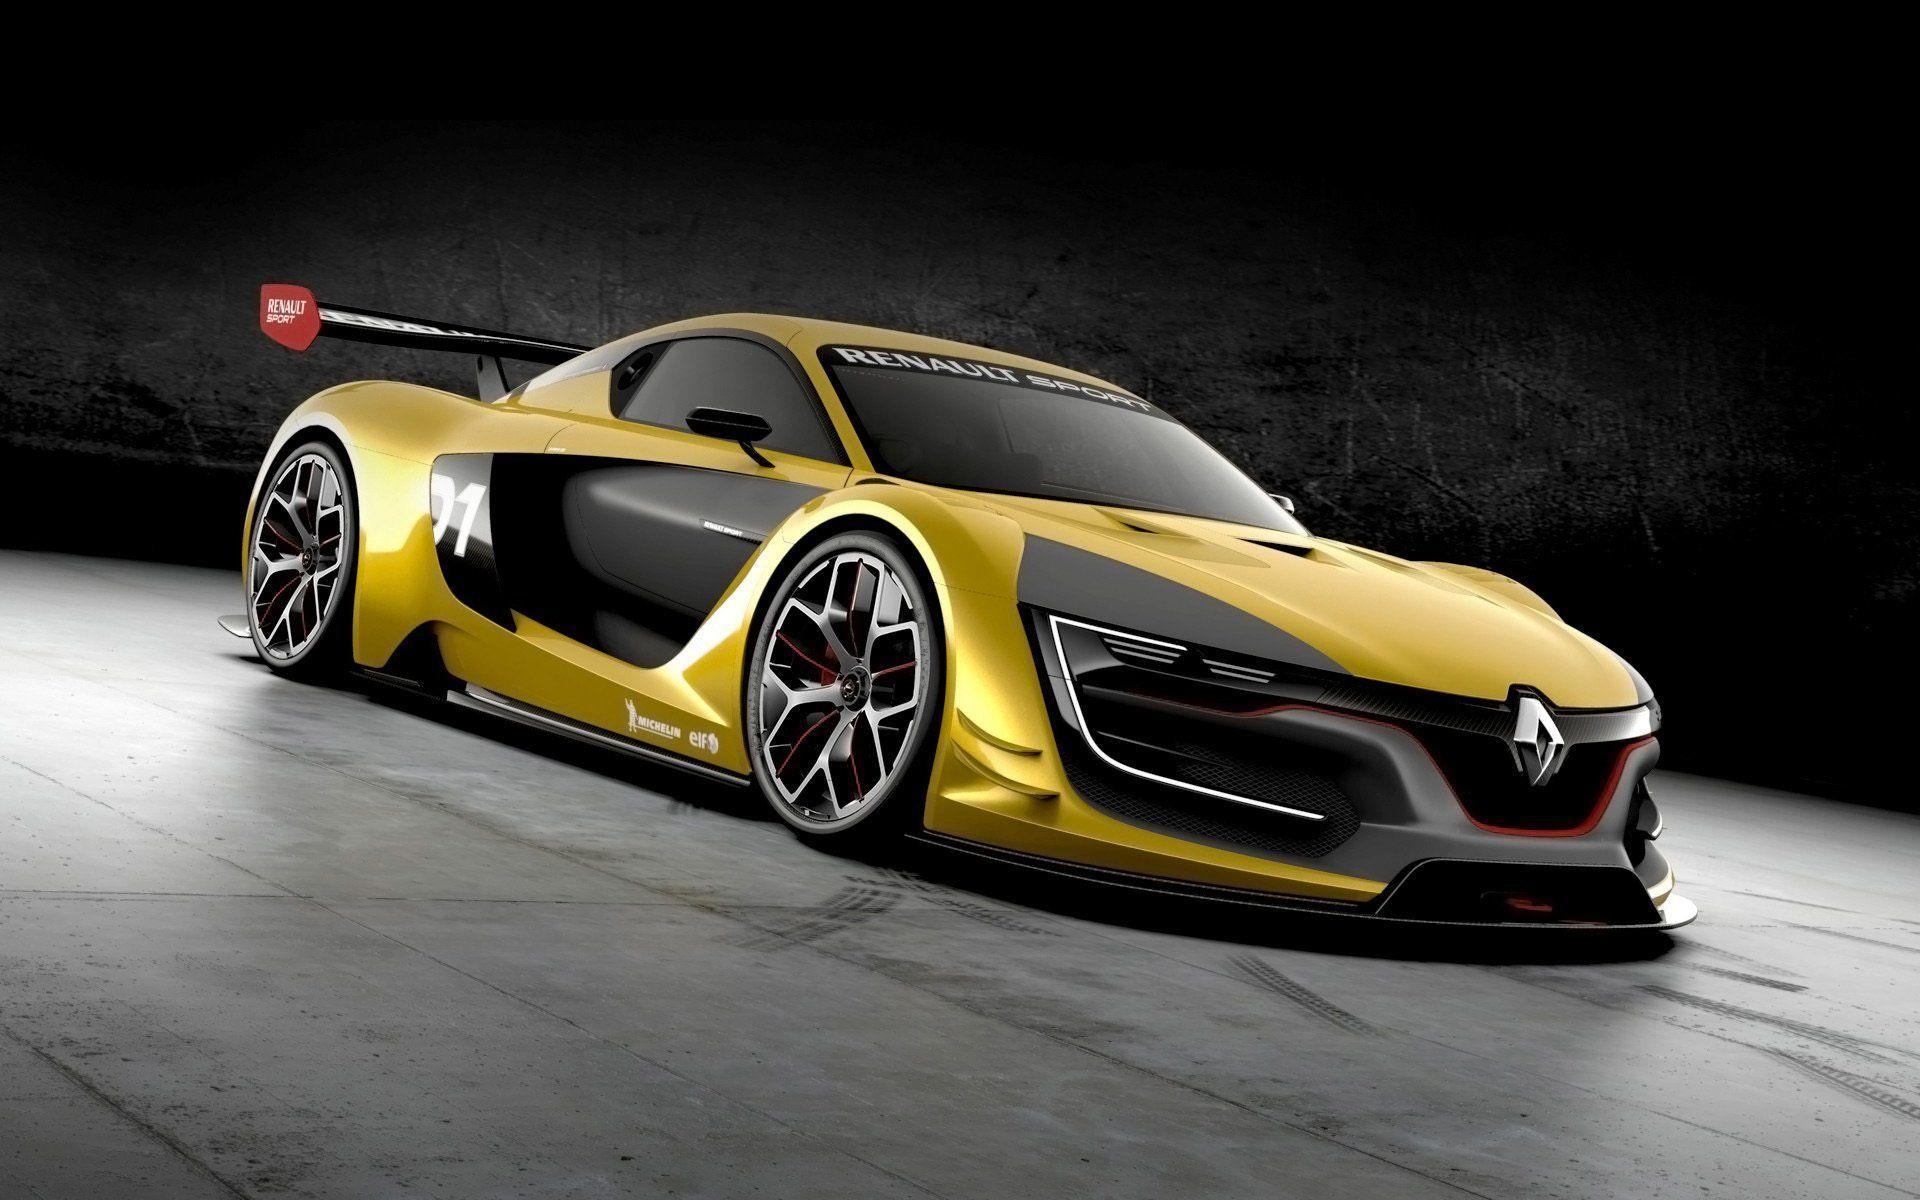 Wallpapers sportscar, supercar, motorsport, yellow, sports